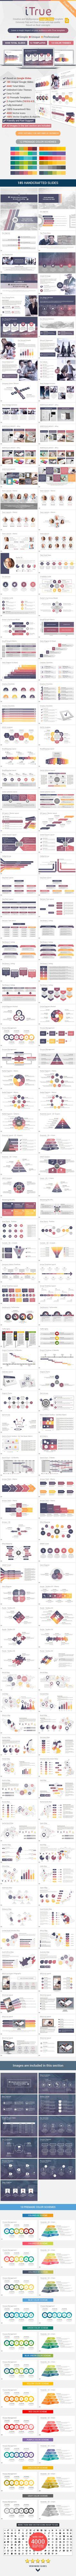 iTrue Multipurpose #Google #Slides Presentation Template - Google Slides Presentation #Templates Download here:  https://graphicriver.net/item/itrue-multipurpose-google-slides-presentation-template/14933934?ref=alena994